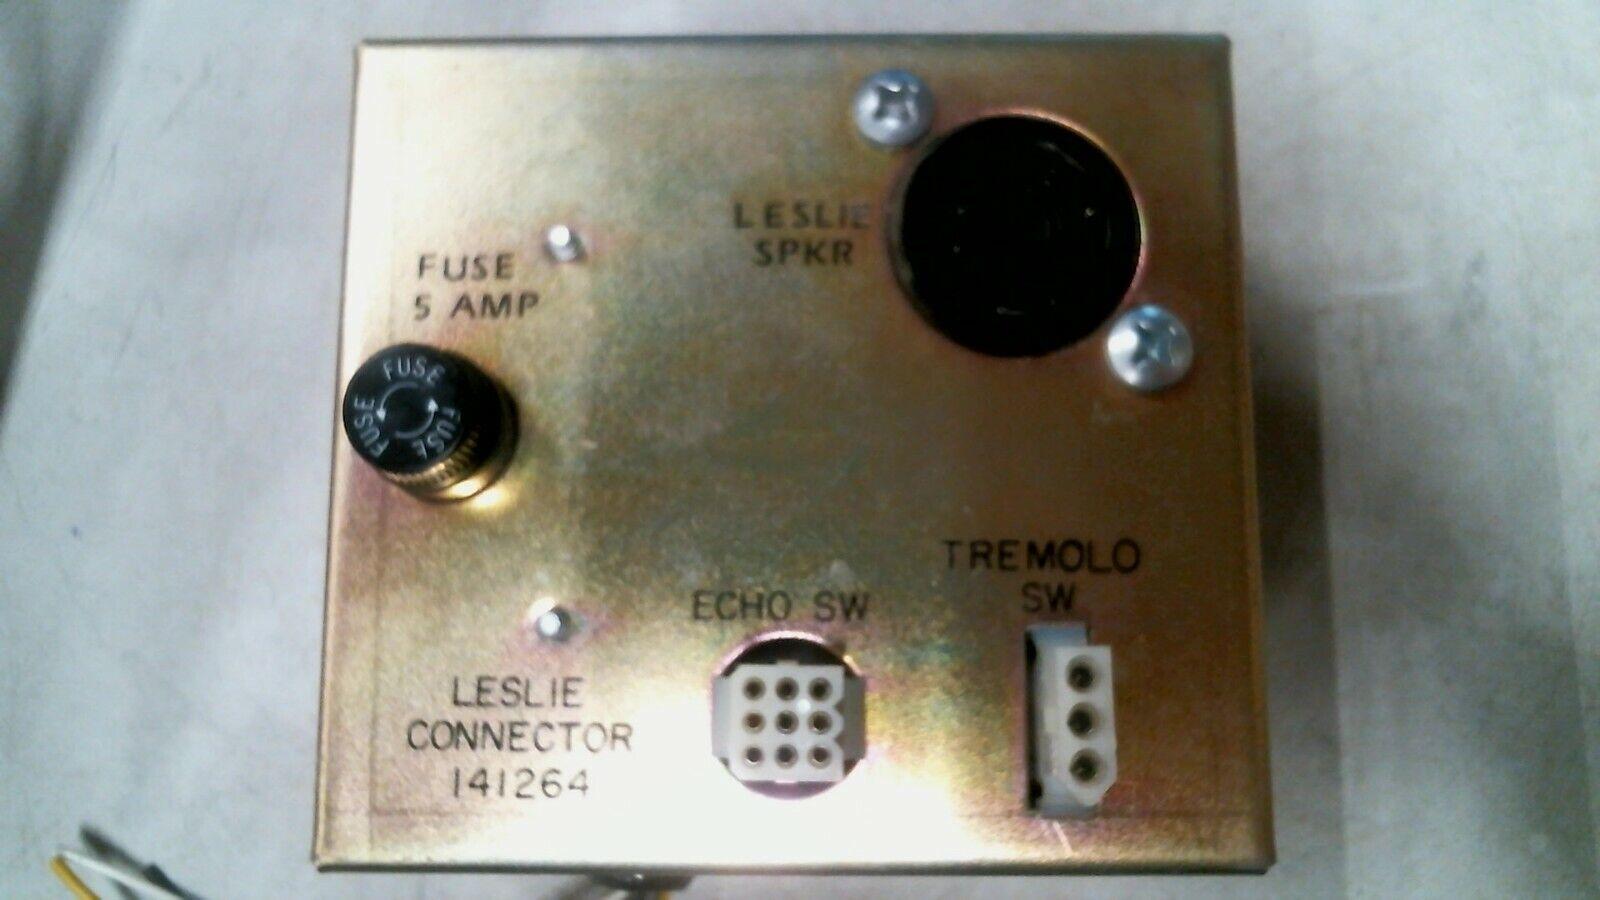 HAMMOND LESLIE 141264 CONNECTOR KIT 9 PIN LAUTER -FREIE SHIPPING